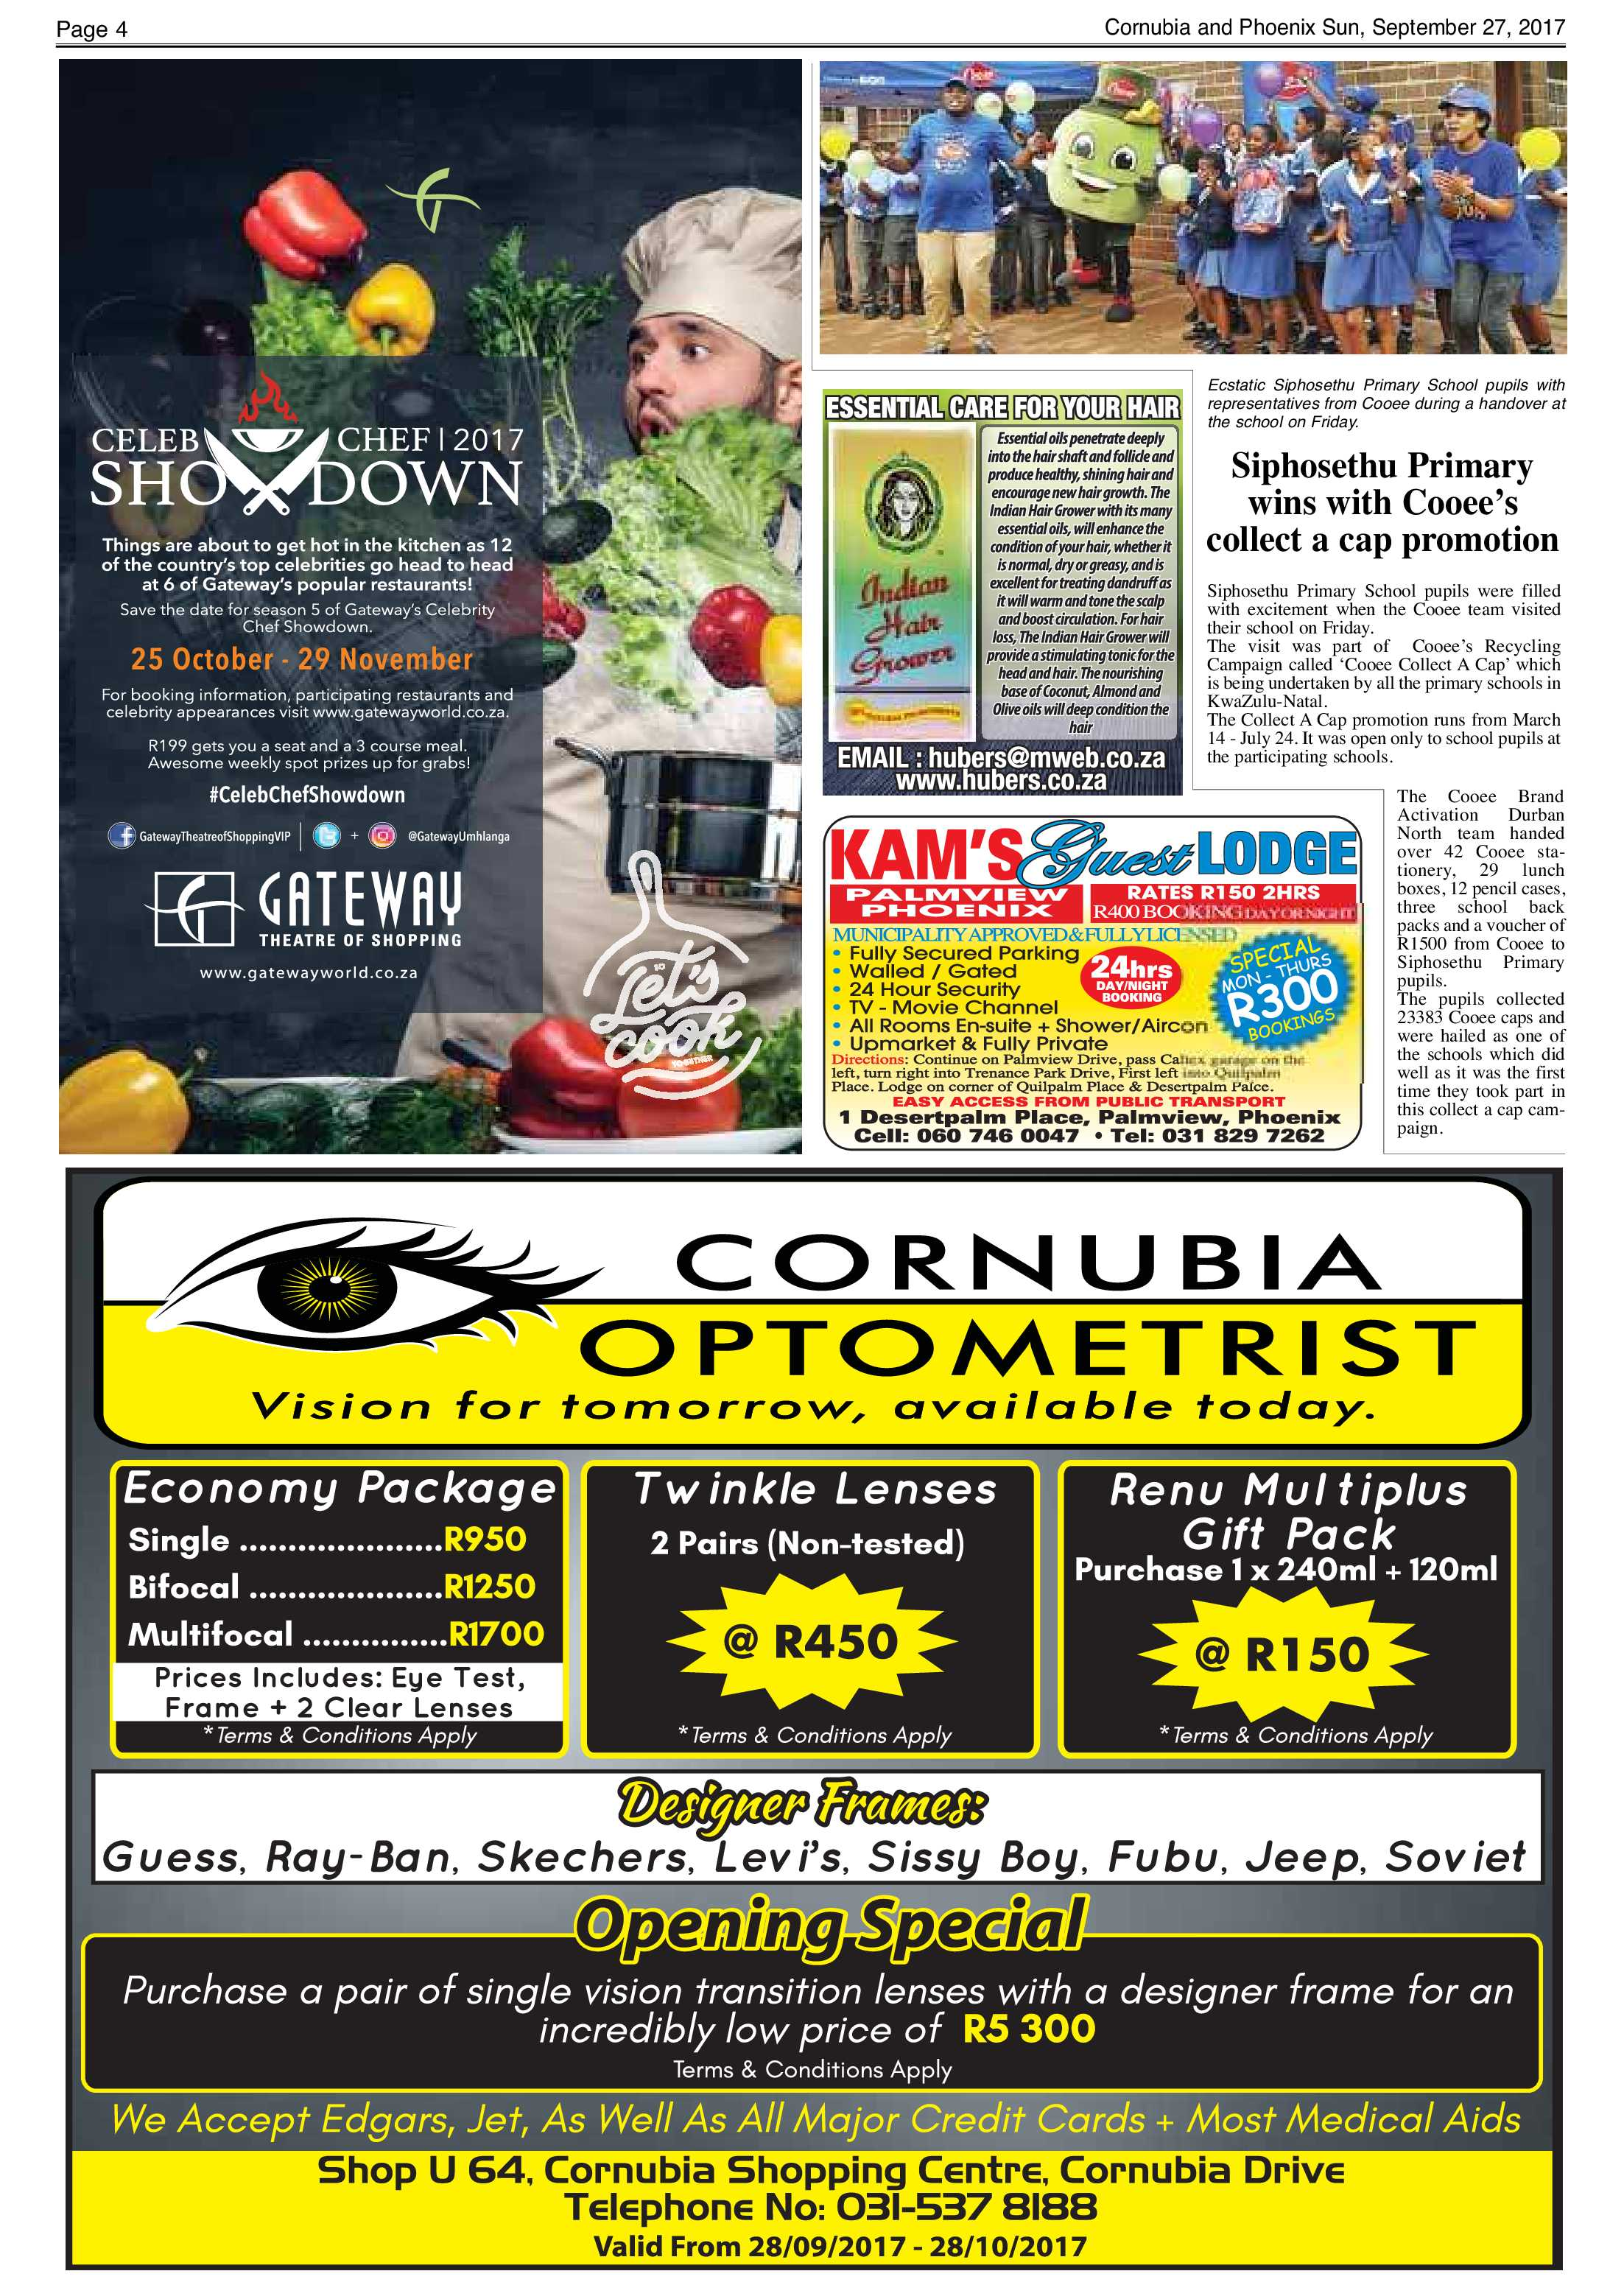 cornubia-phoenix-sun-september-27-epapers-page-4